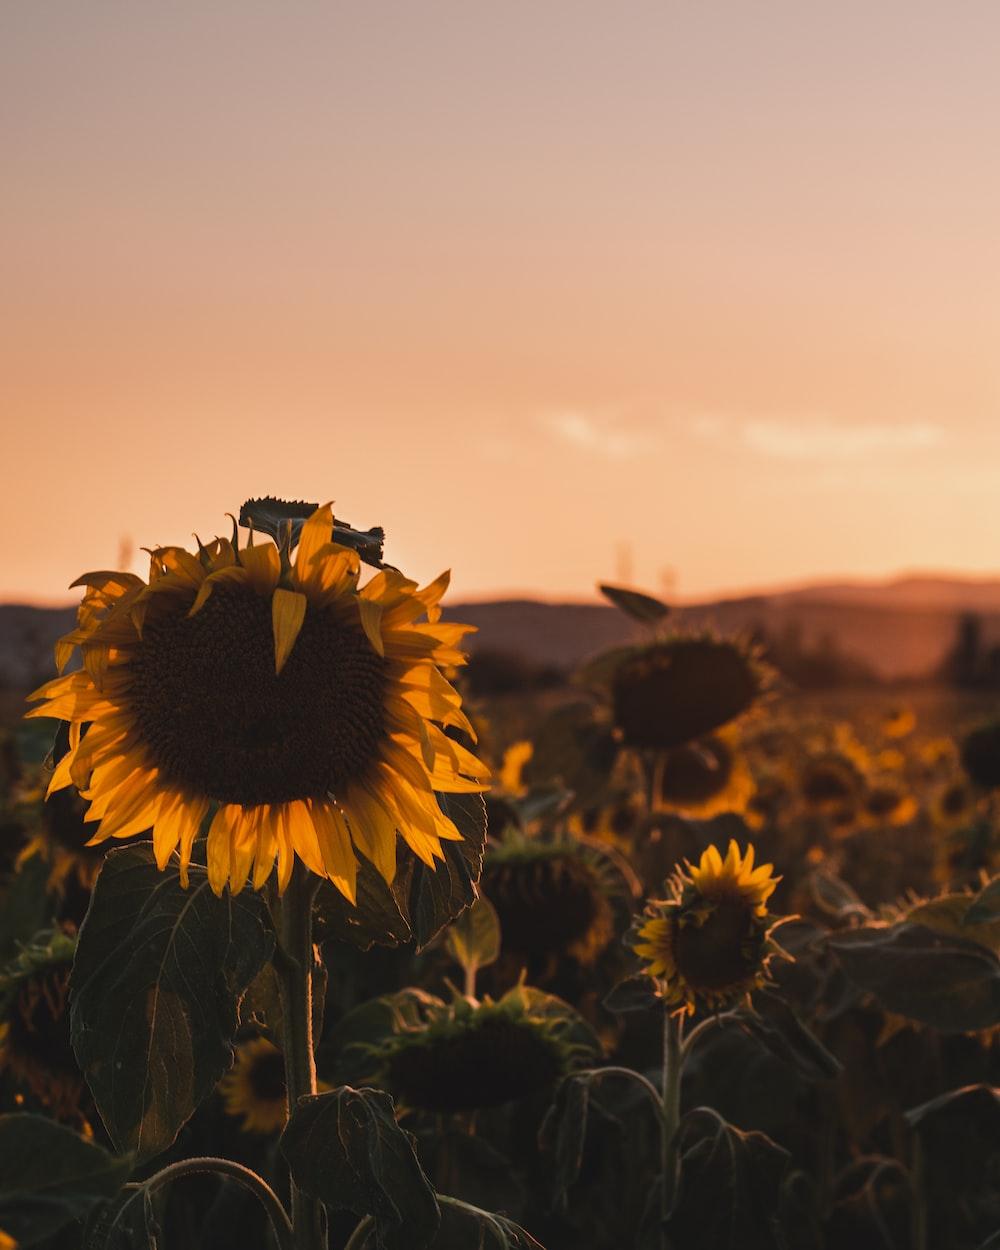 sunflower field under gray sky during daytime